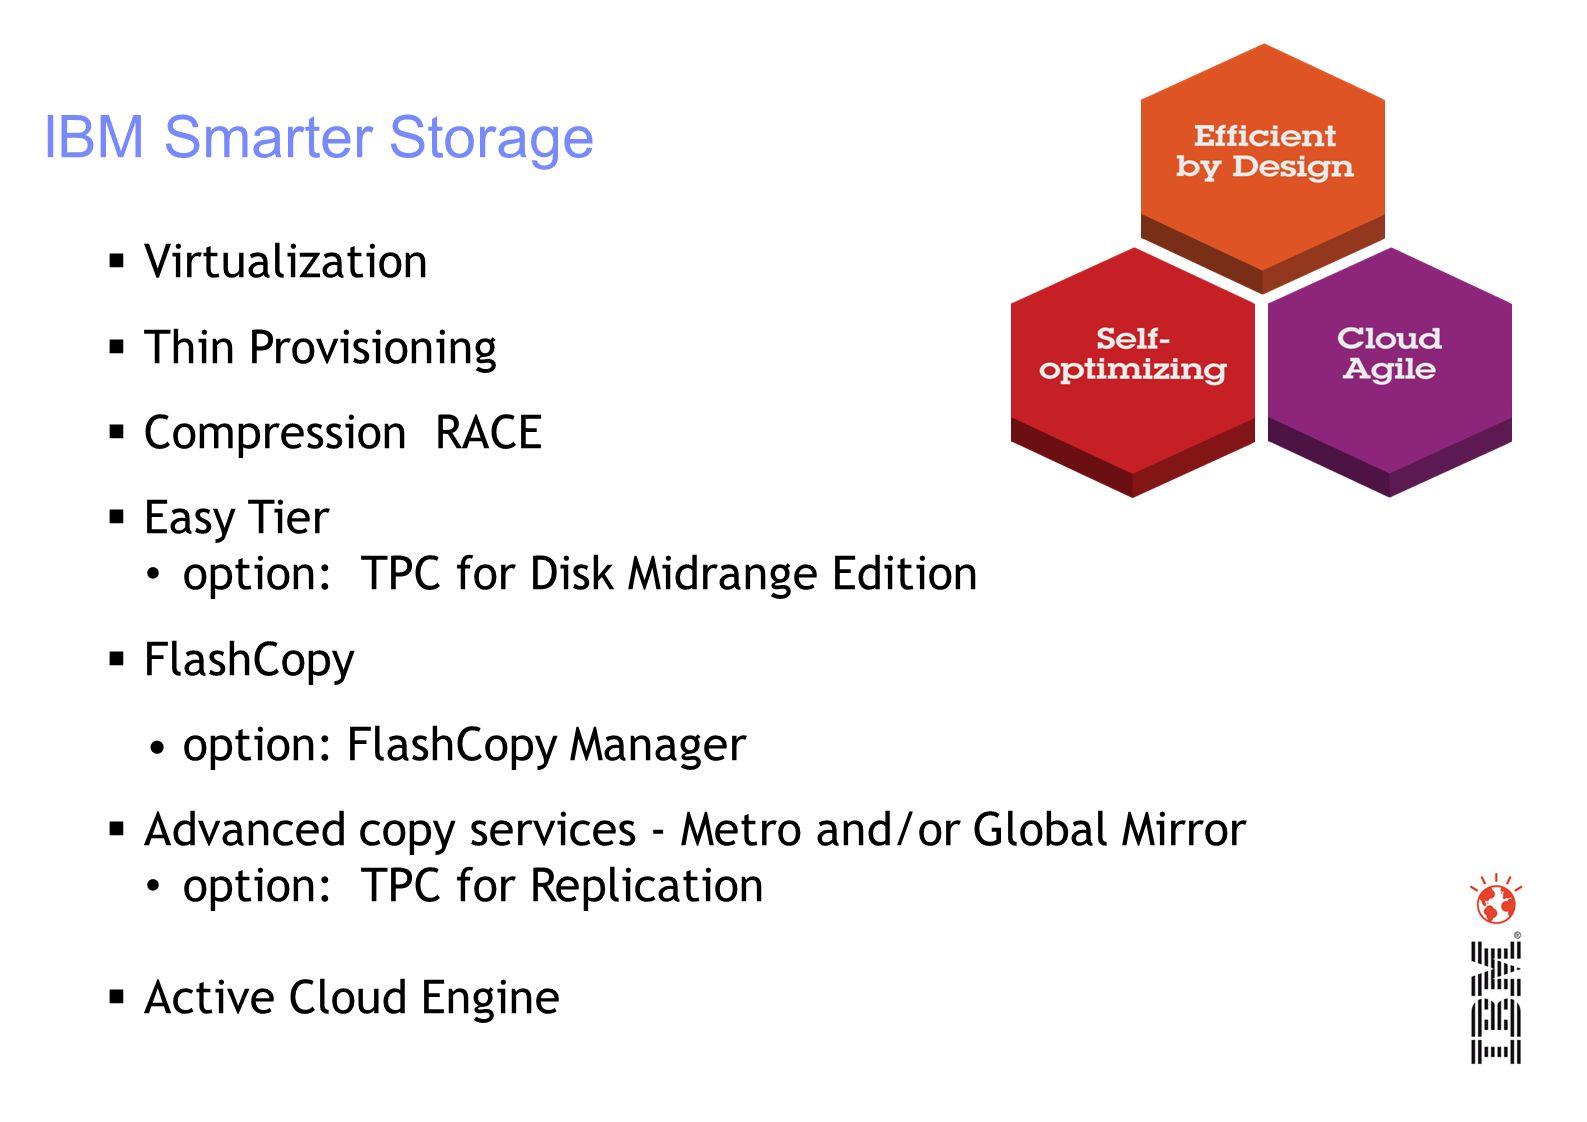 IBM Smarter Storage Virtualization Thin Provisioning Compression RACE Easy Tier option: TPC for Disk Midrange Edition FlashCopy option: FlashCopy Mana